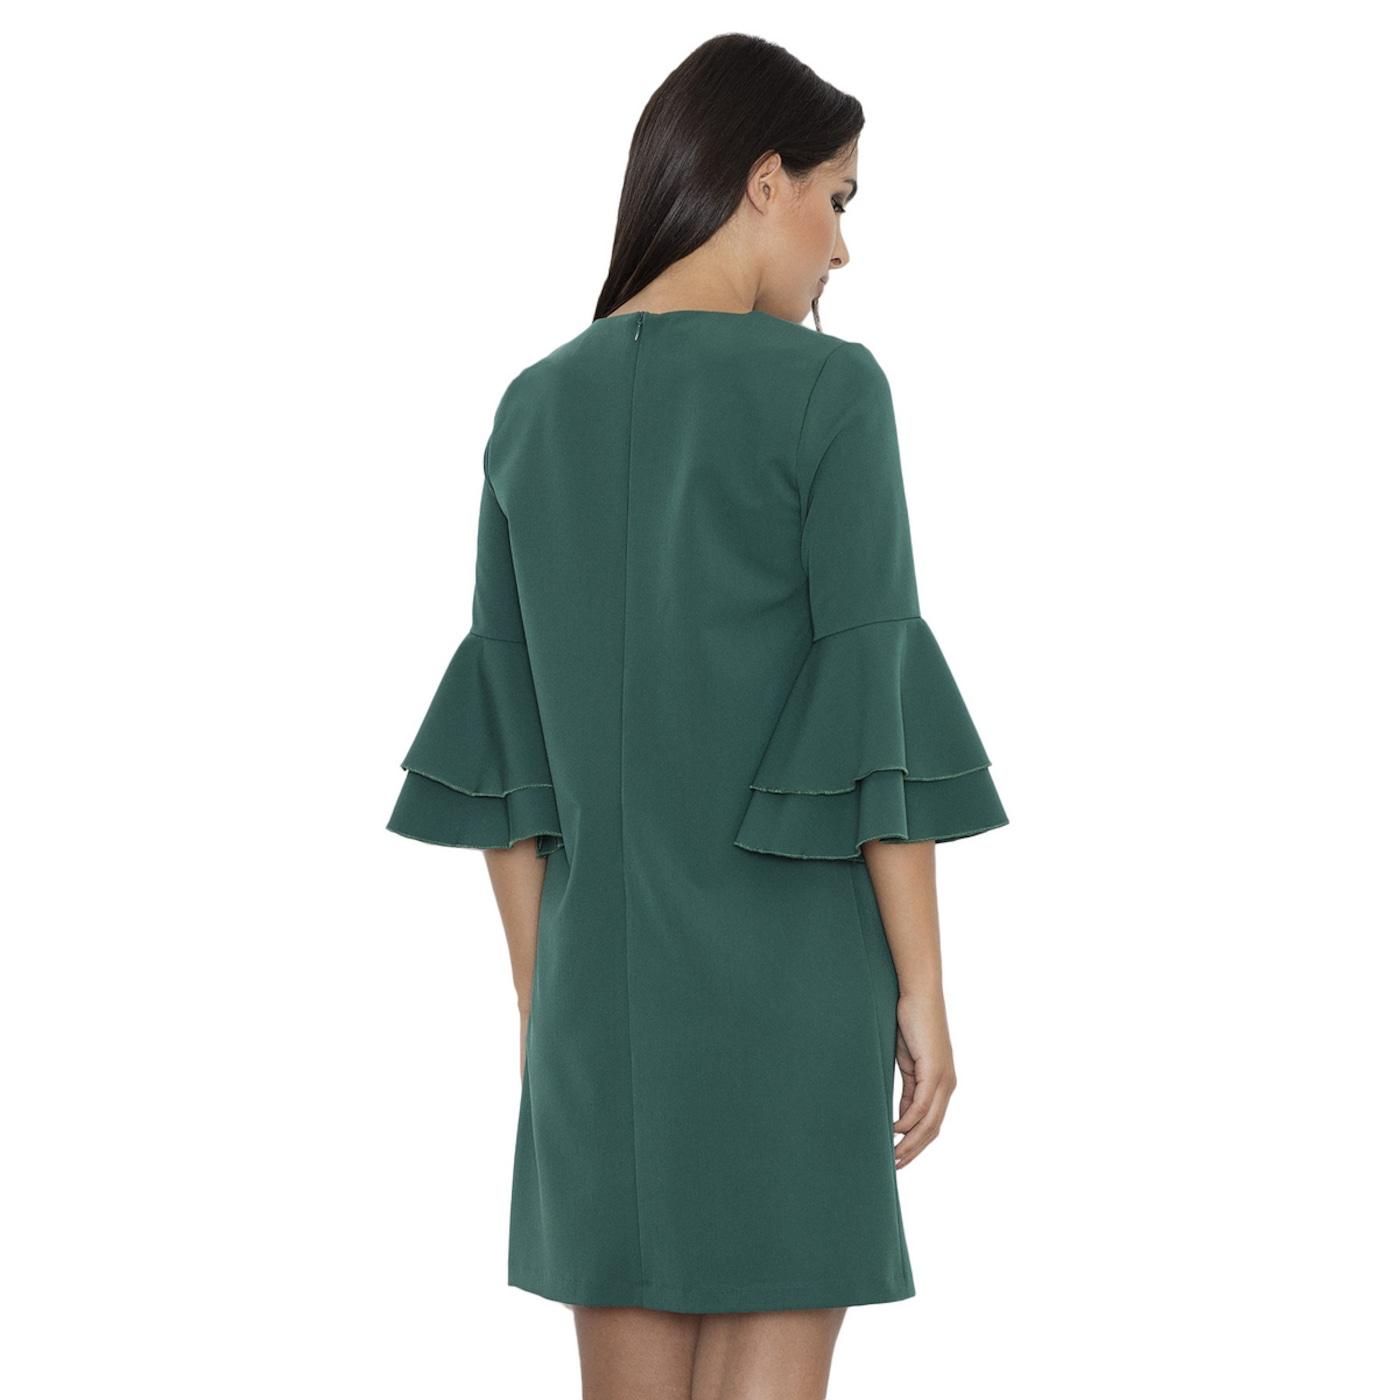 Figl Womans Dress M564 dámské Green S